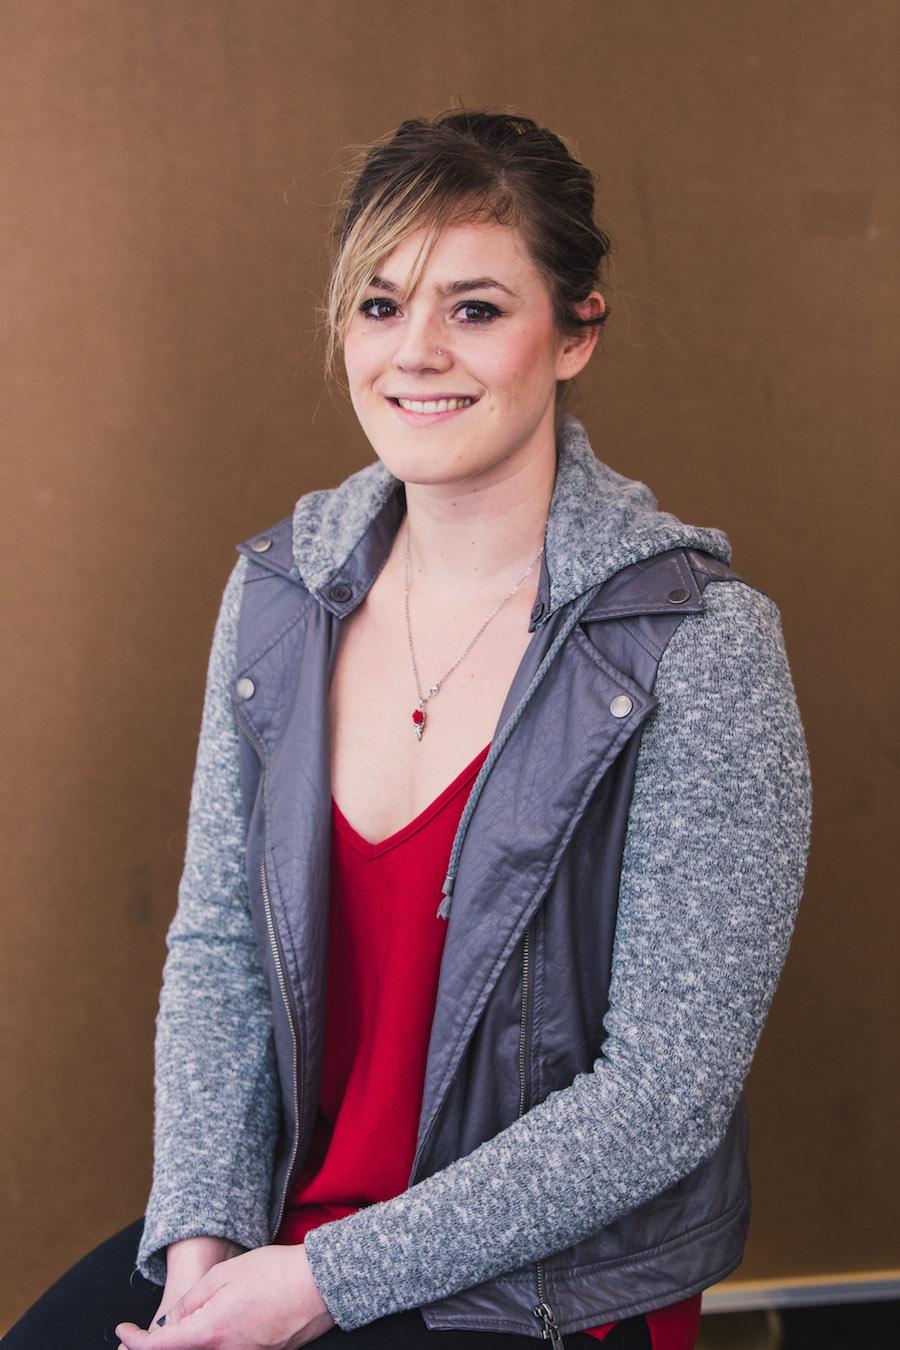 Miranda Howitt Rithm Student